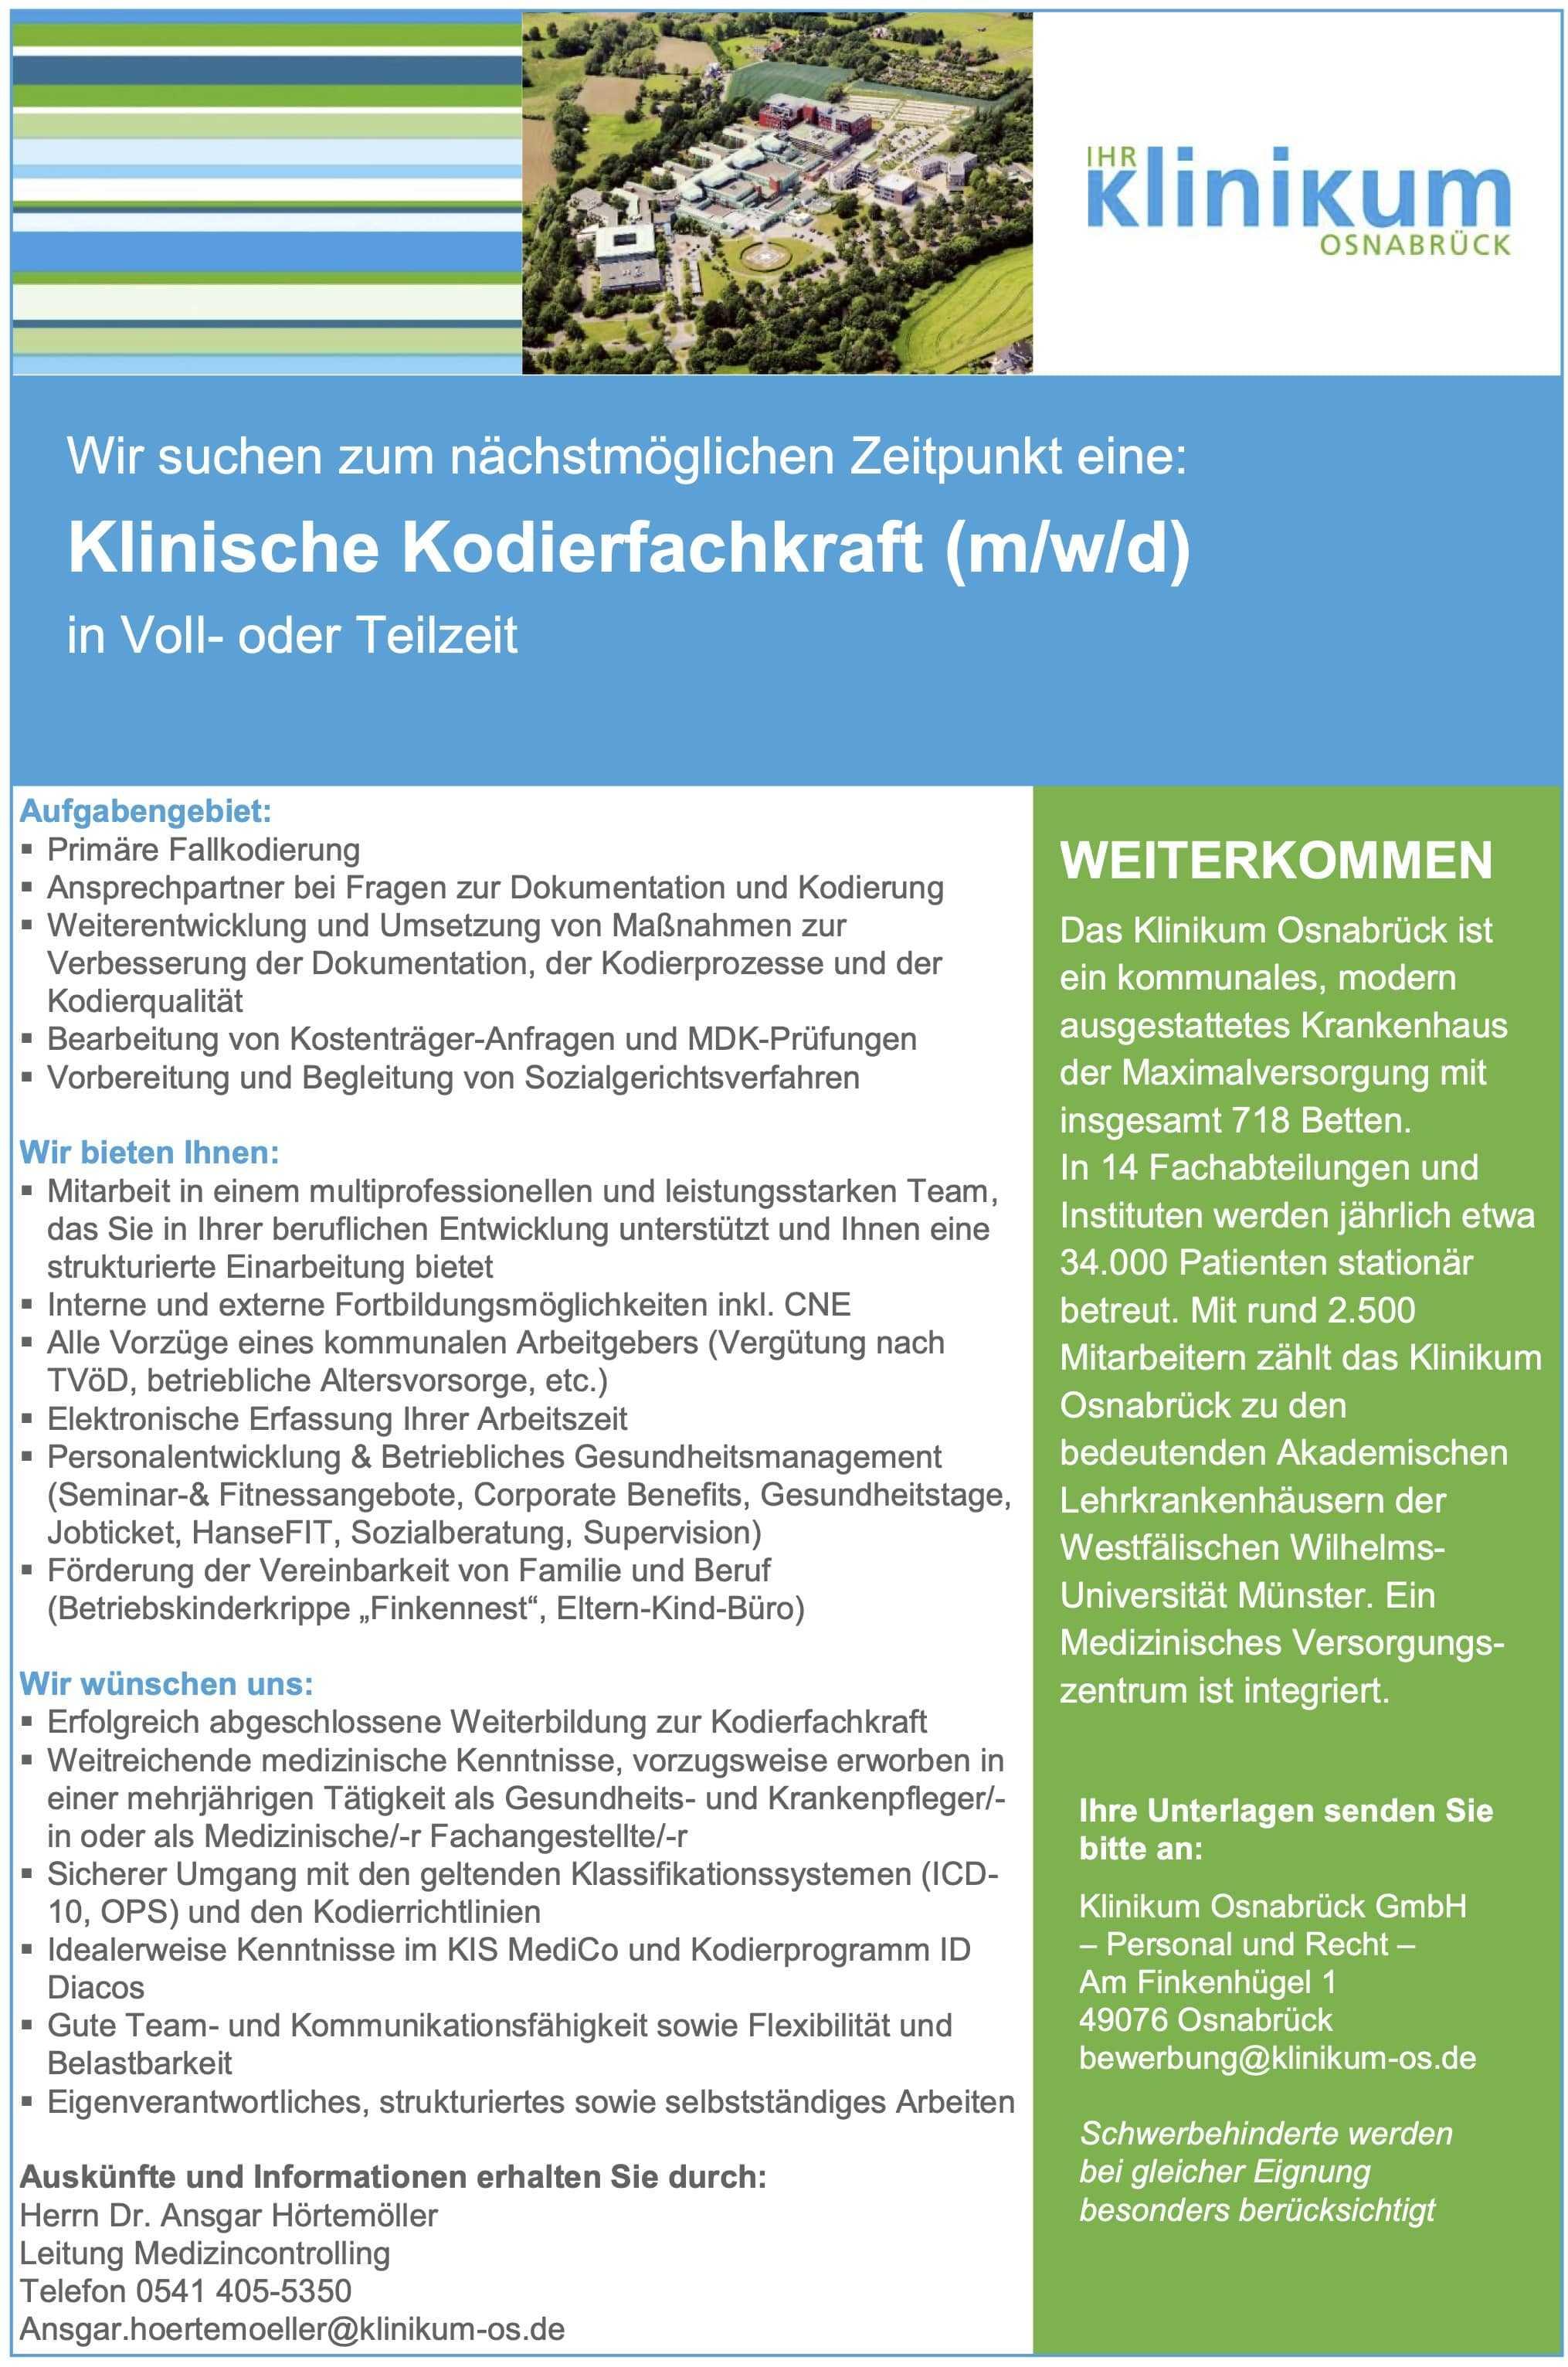 Klinische Kodierfachkraft (m/w/d)